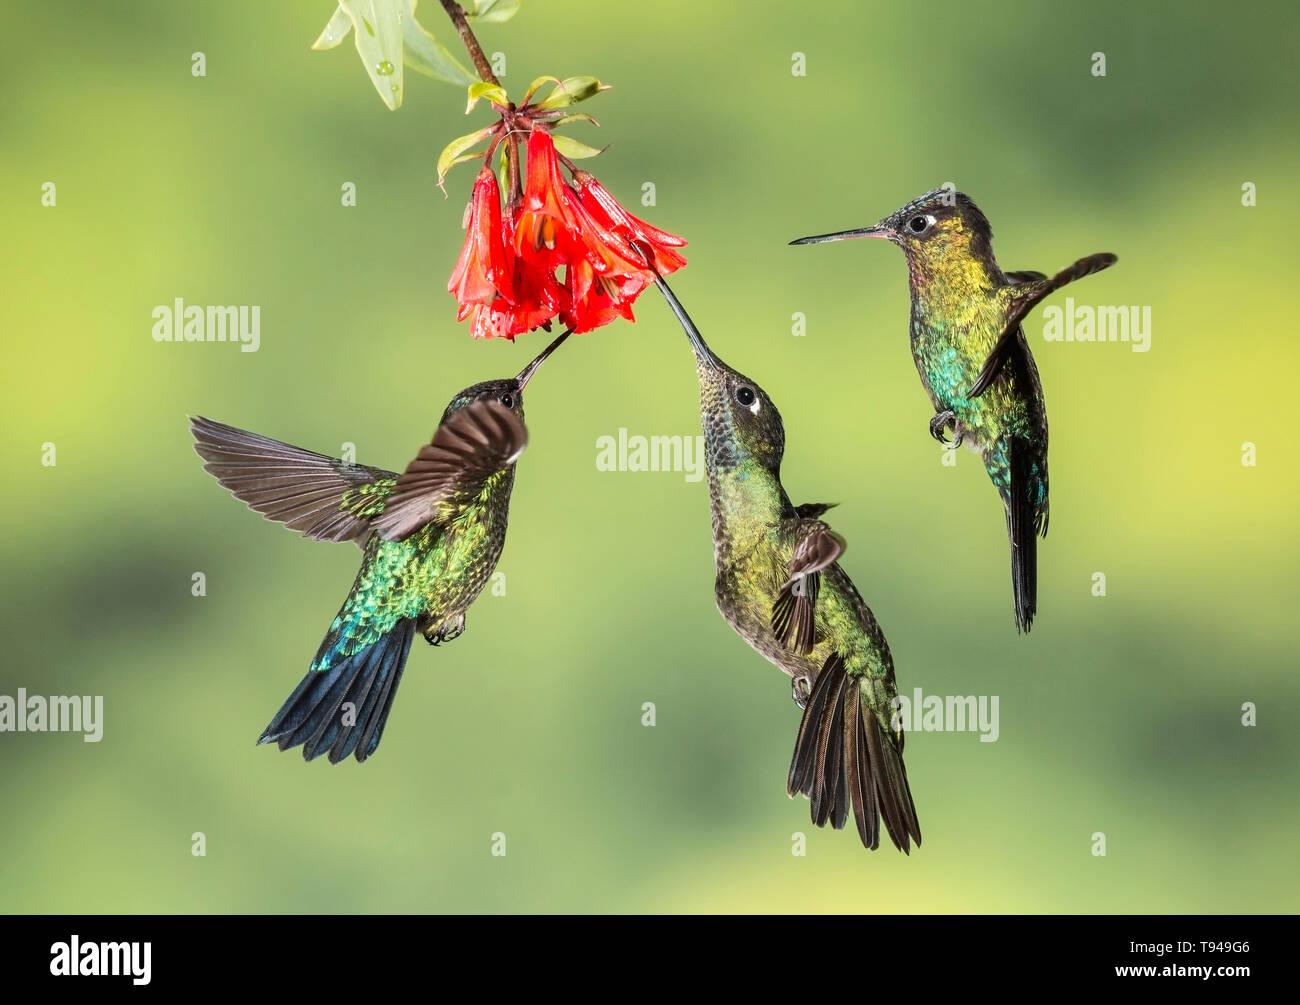 fiery-throated hummingbird three individuals in flight, feeding on nectar of flower, Costa Rica - Stock Image